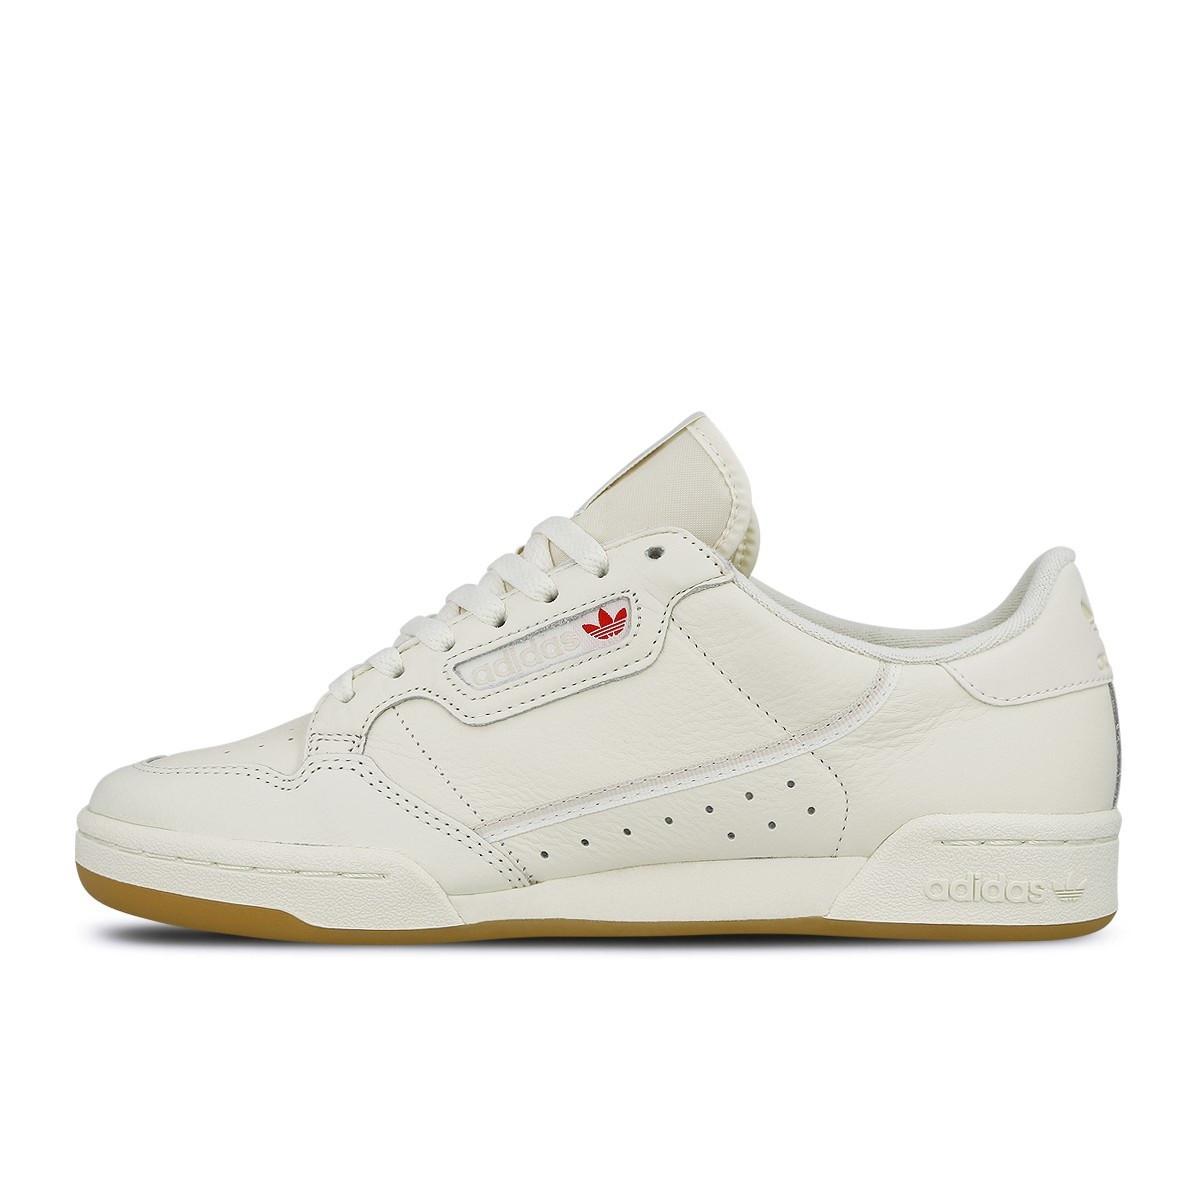 Basket adidas Originals CONTINENTAL 80 BD7975